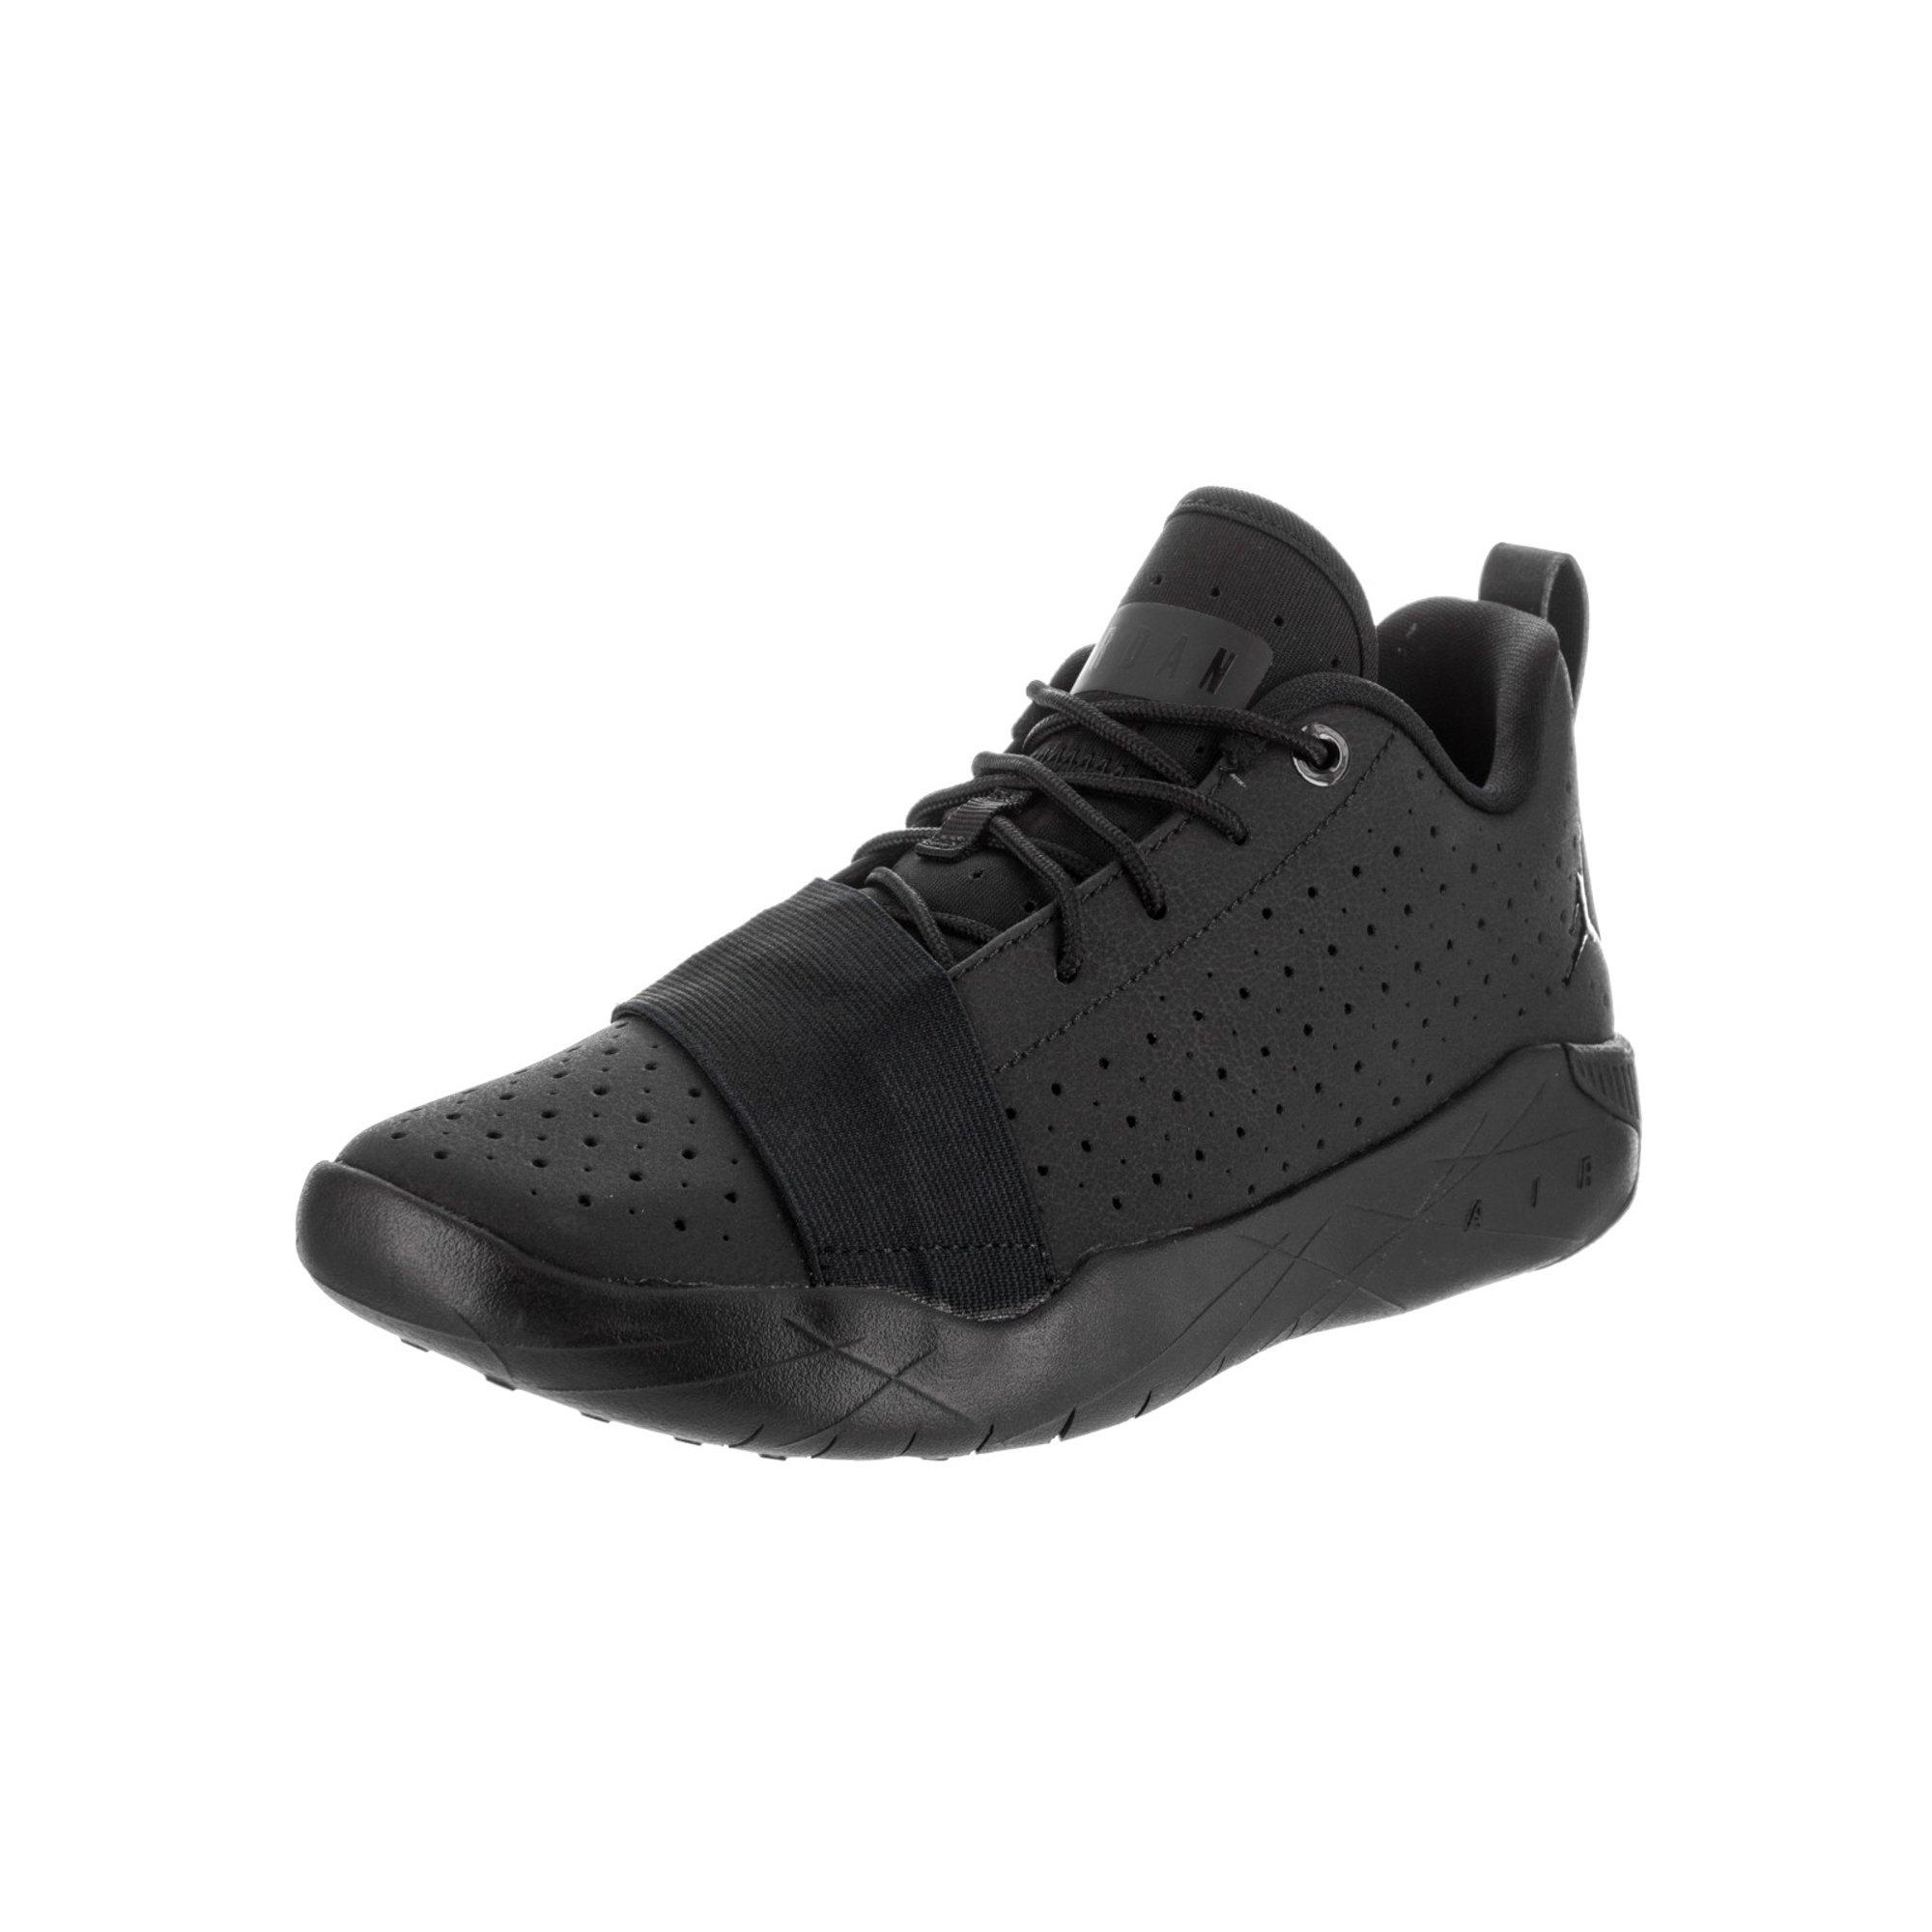 brand new ed76d 4d166 Nike Jordan Kids Jordan 23 Breakout Bg Basketball Shoe ...